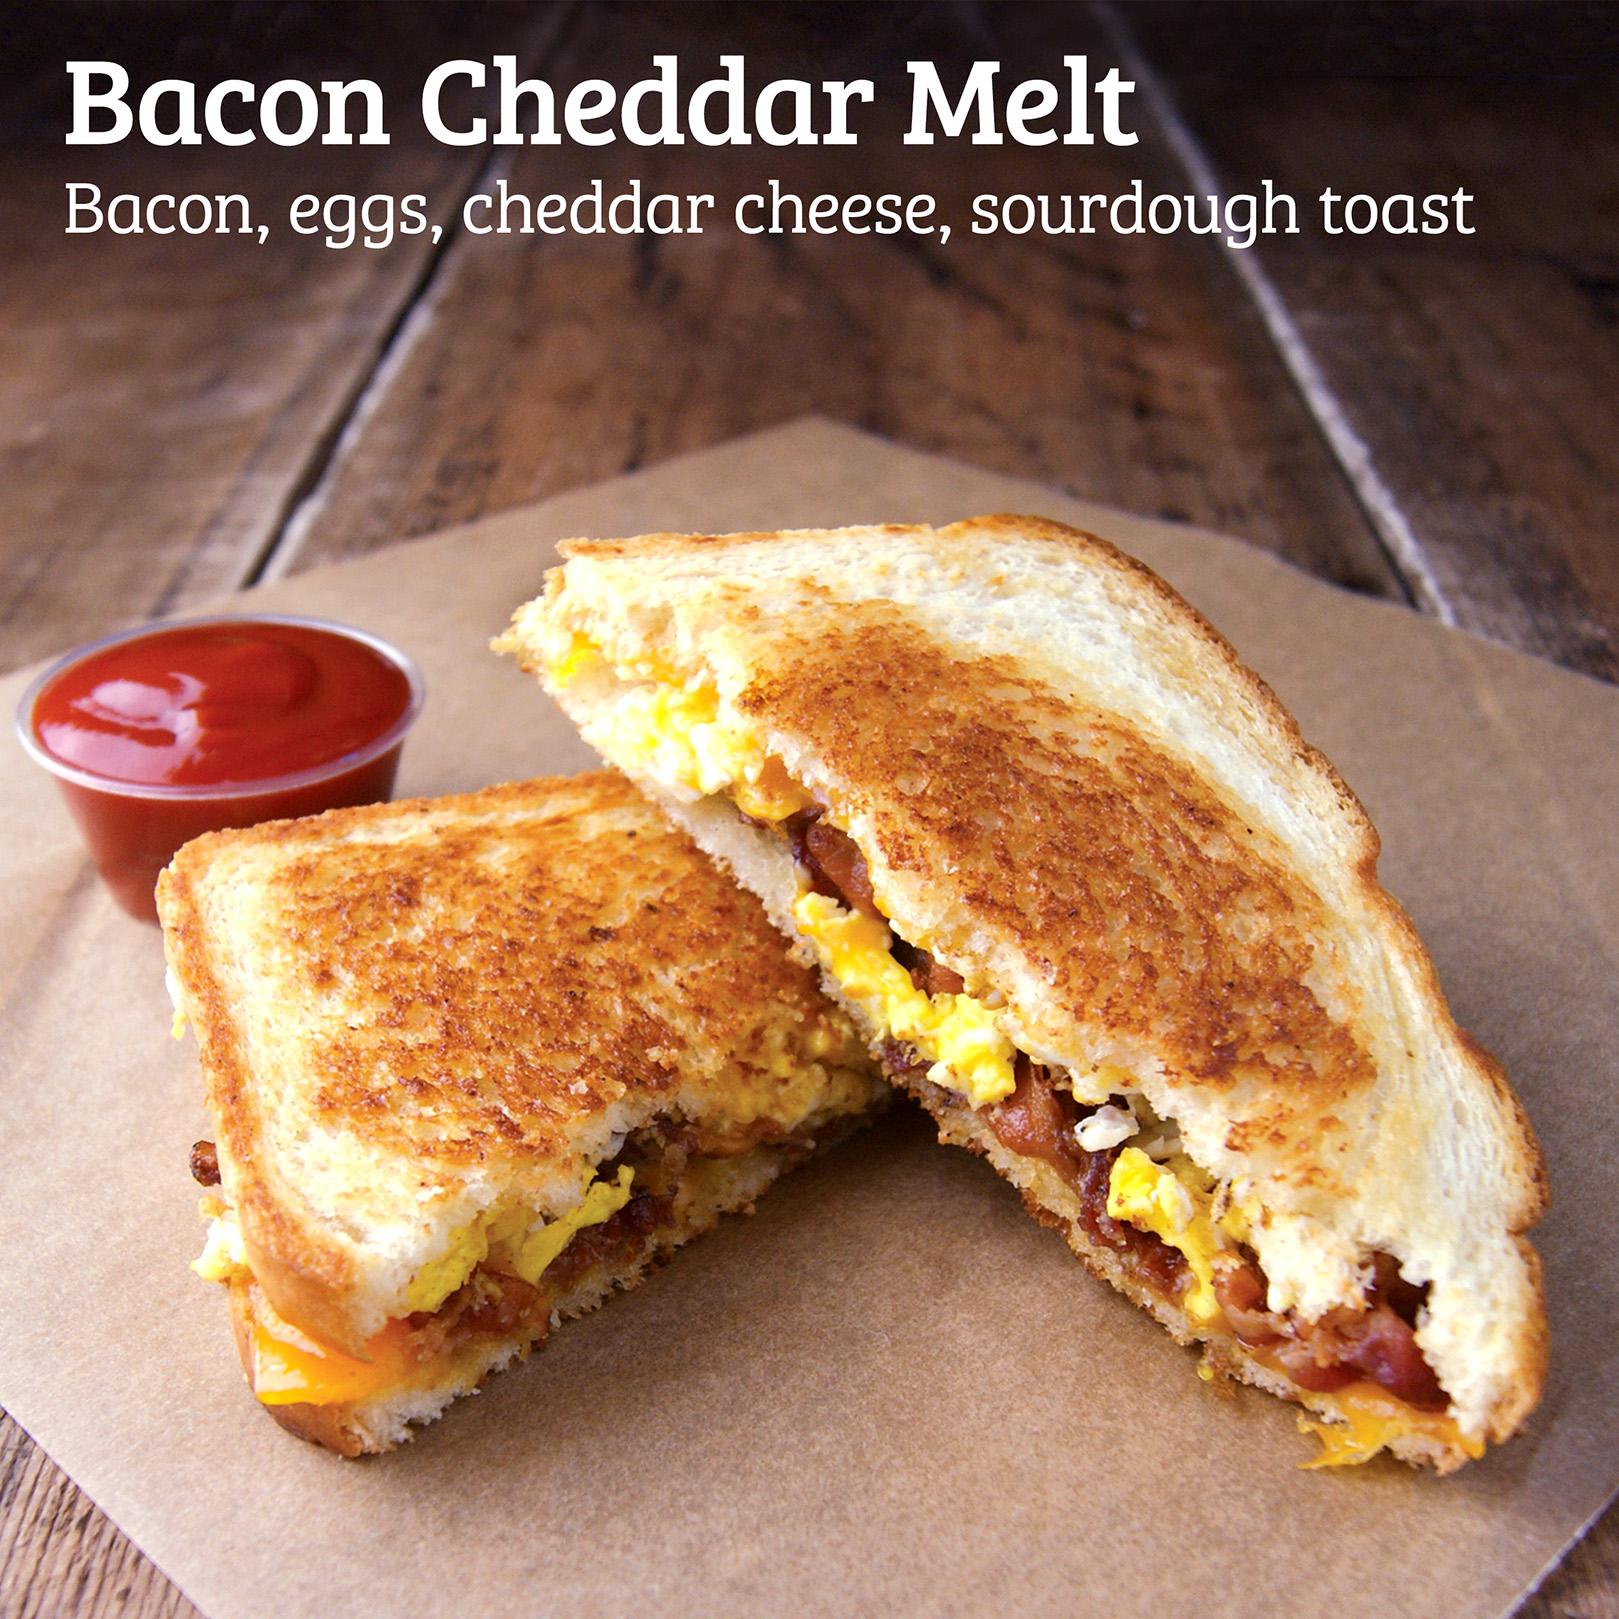 Kidd Valley Bacon Cheddar Melt